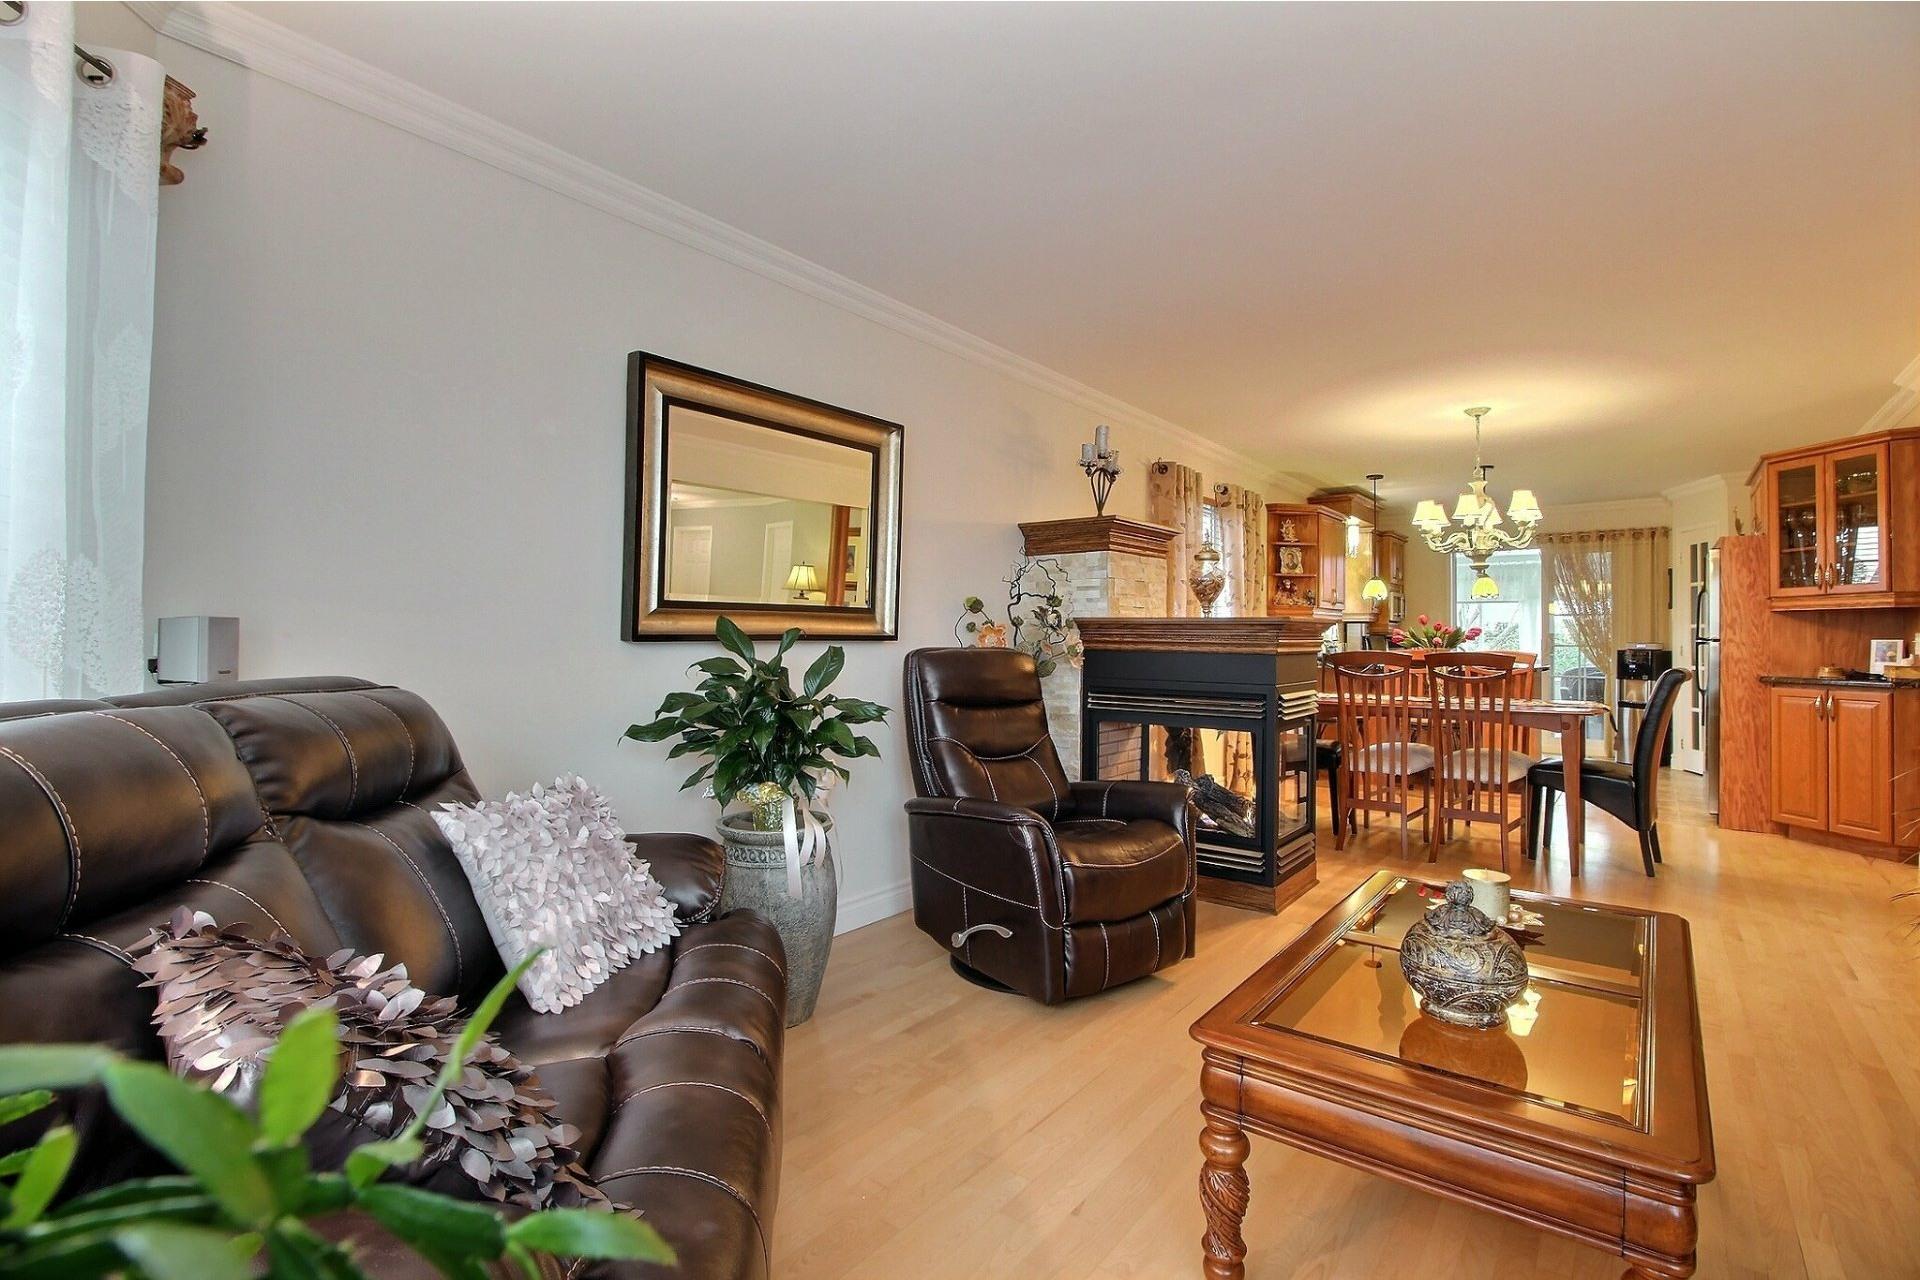 image 4 - House For sale Notre-Dame-des-Prairies - 11 rooms